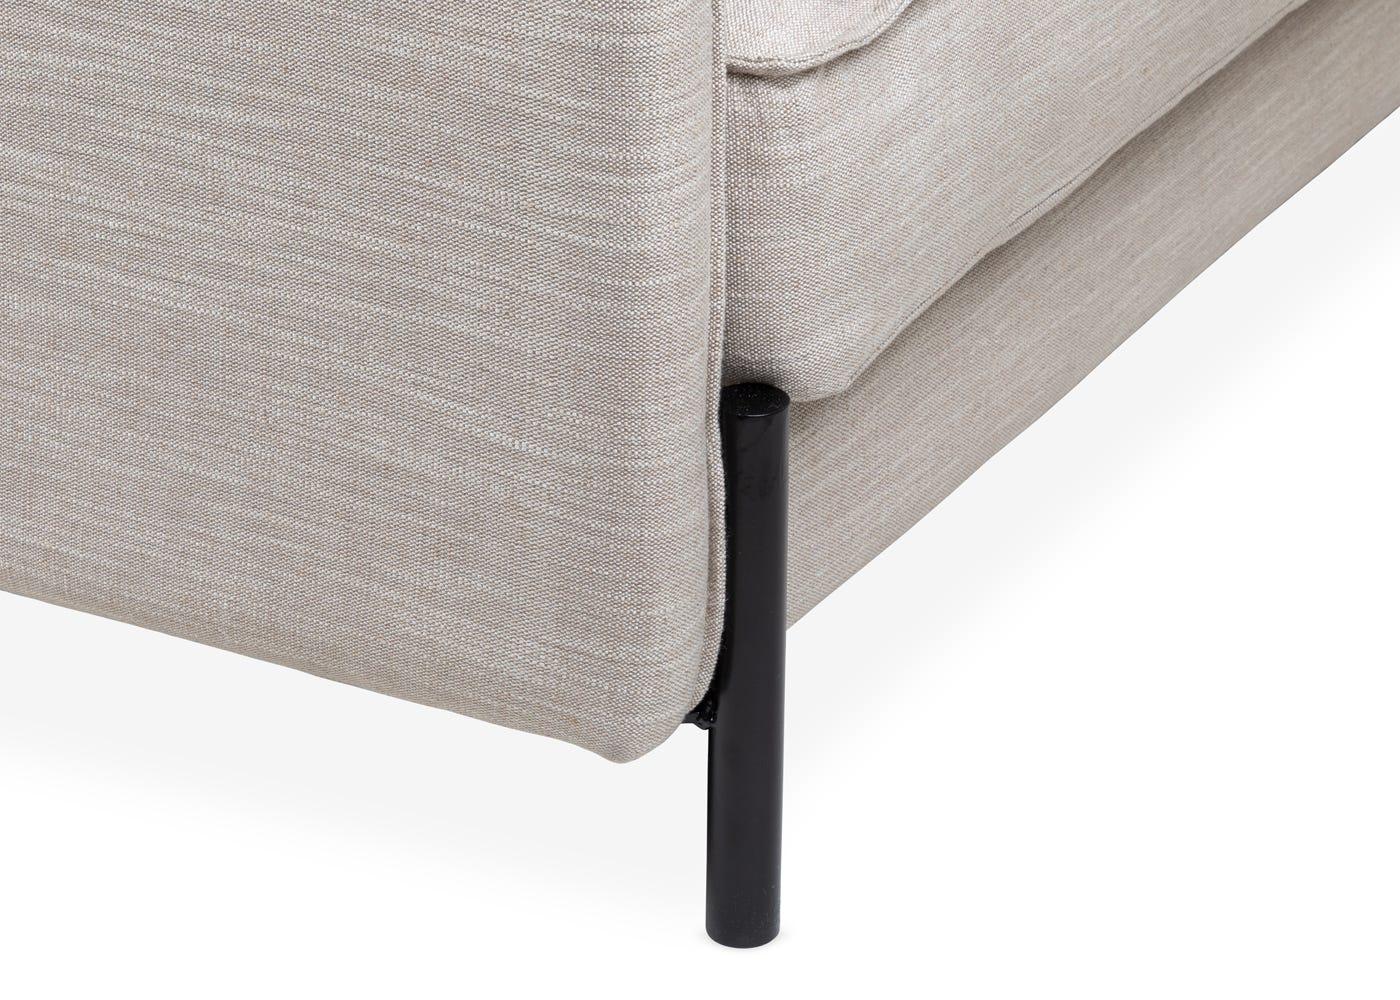 Tortona 4 Seater Sofa in Broad Weave Putty - Leg